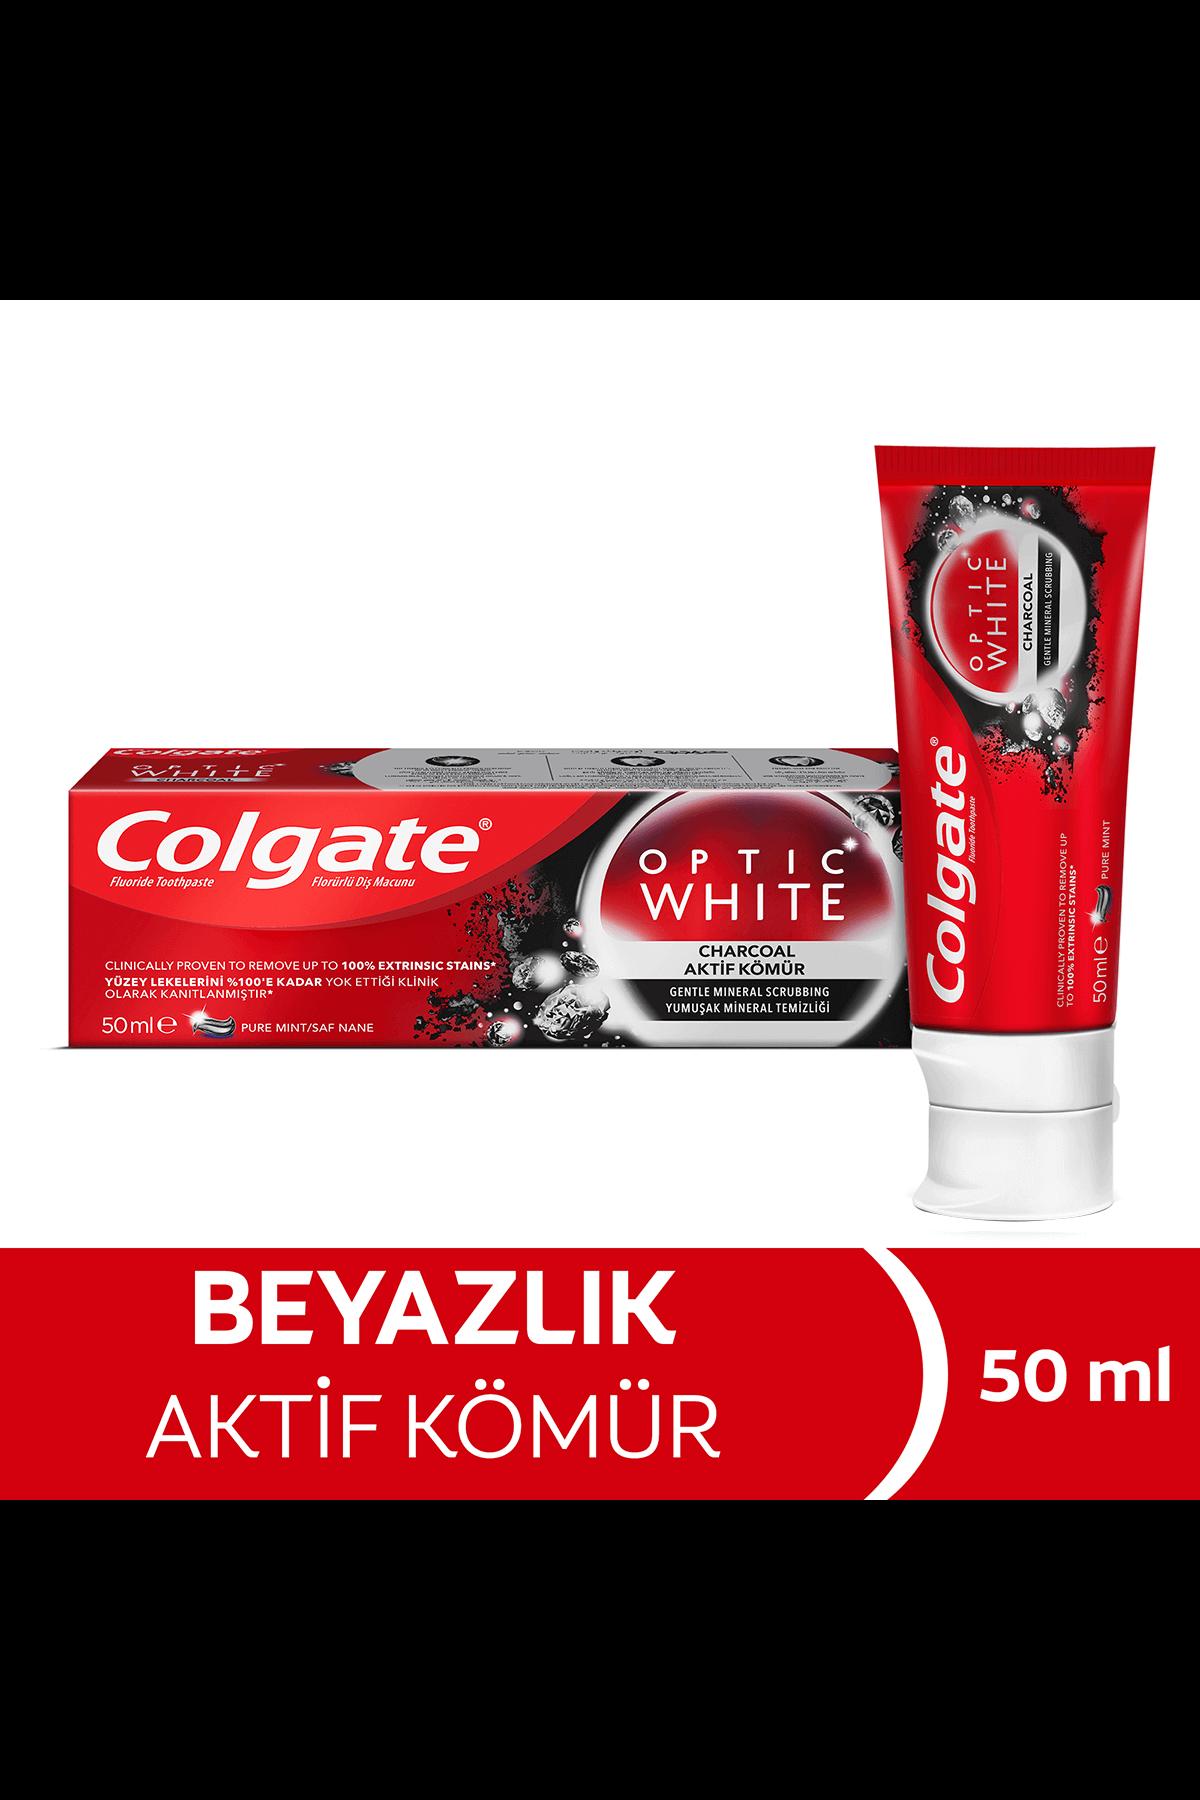 Colgate Optik White Diş Macunu Aktif Kömür 50 ml